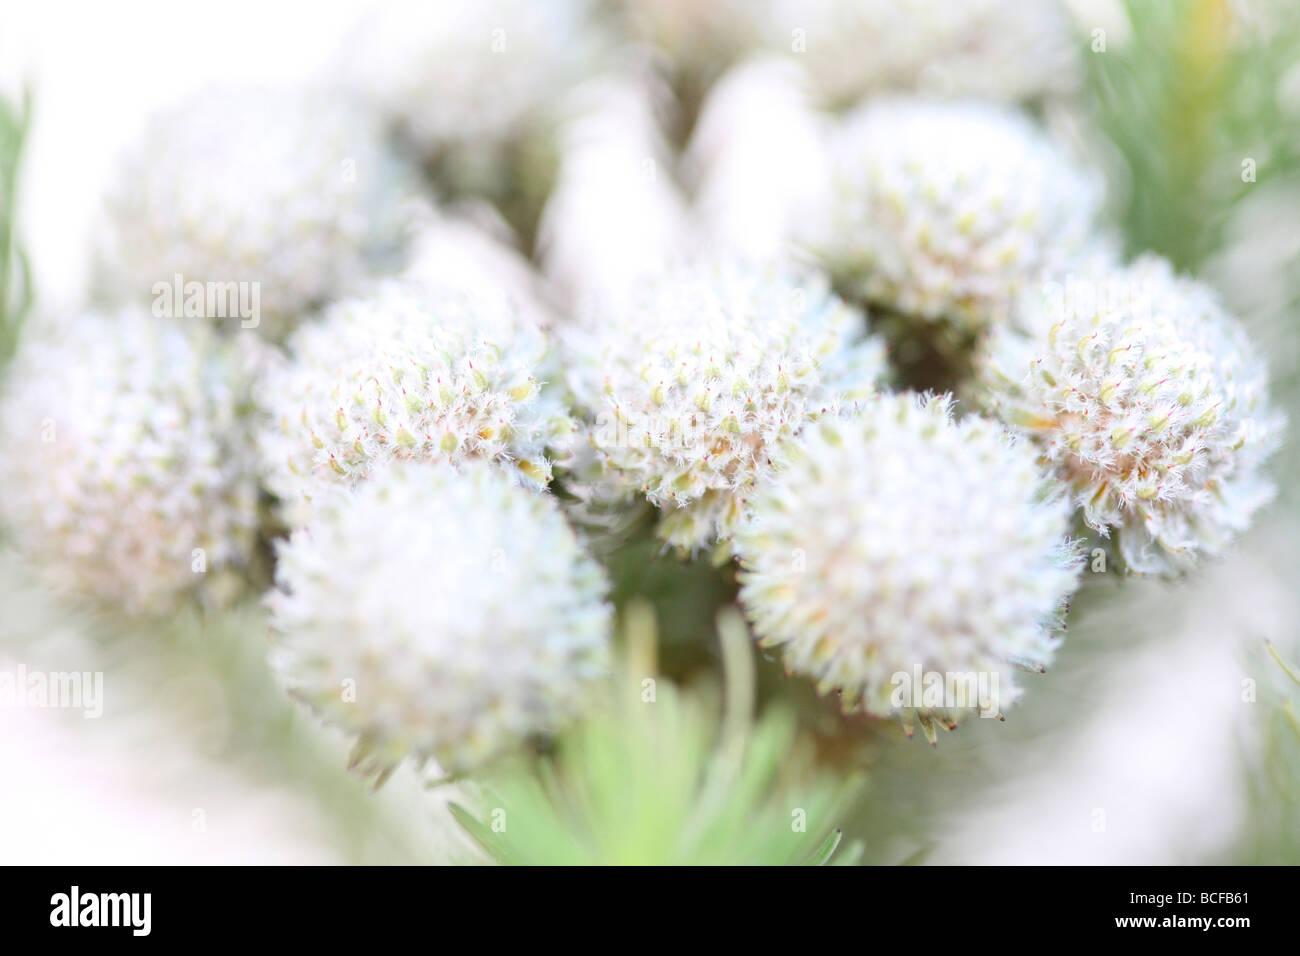 beautiful full frame image of Brunia flower heads fine art photography Jane Ann Butler Photography JABP426 Stock Photo